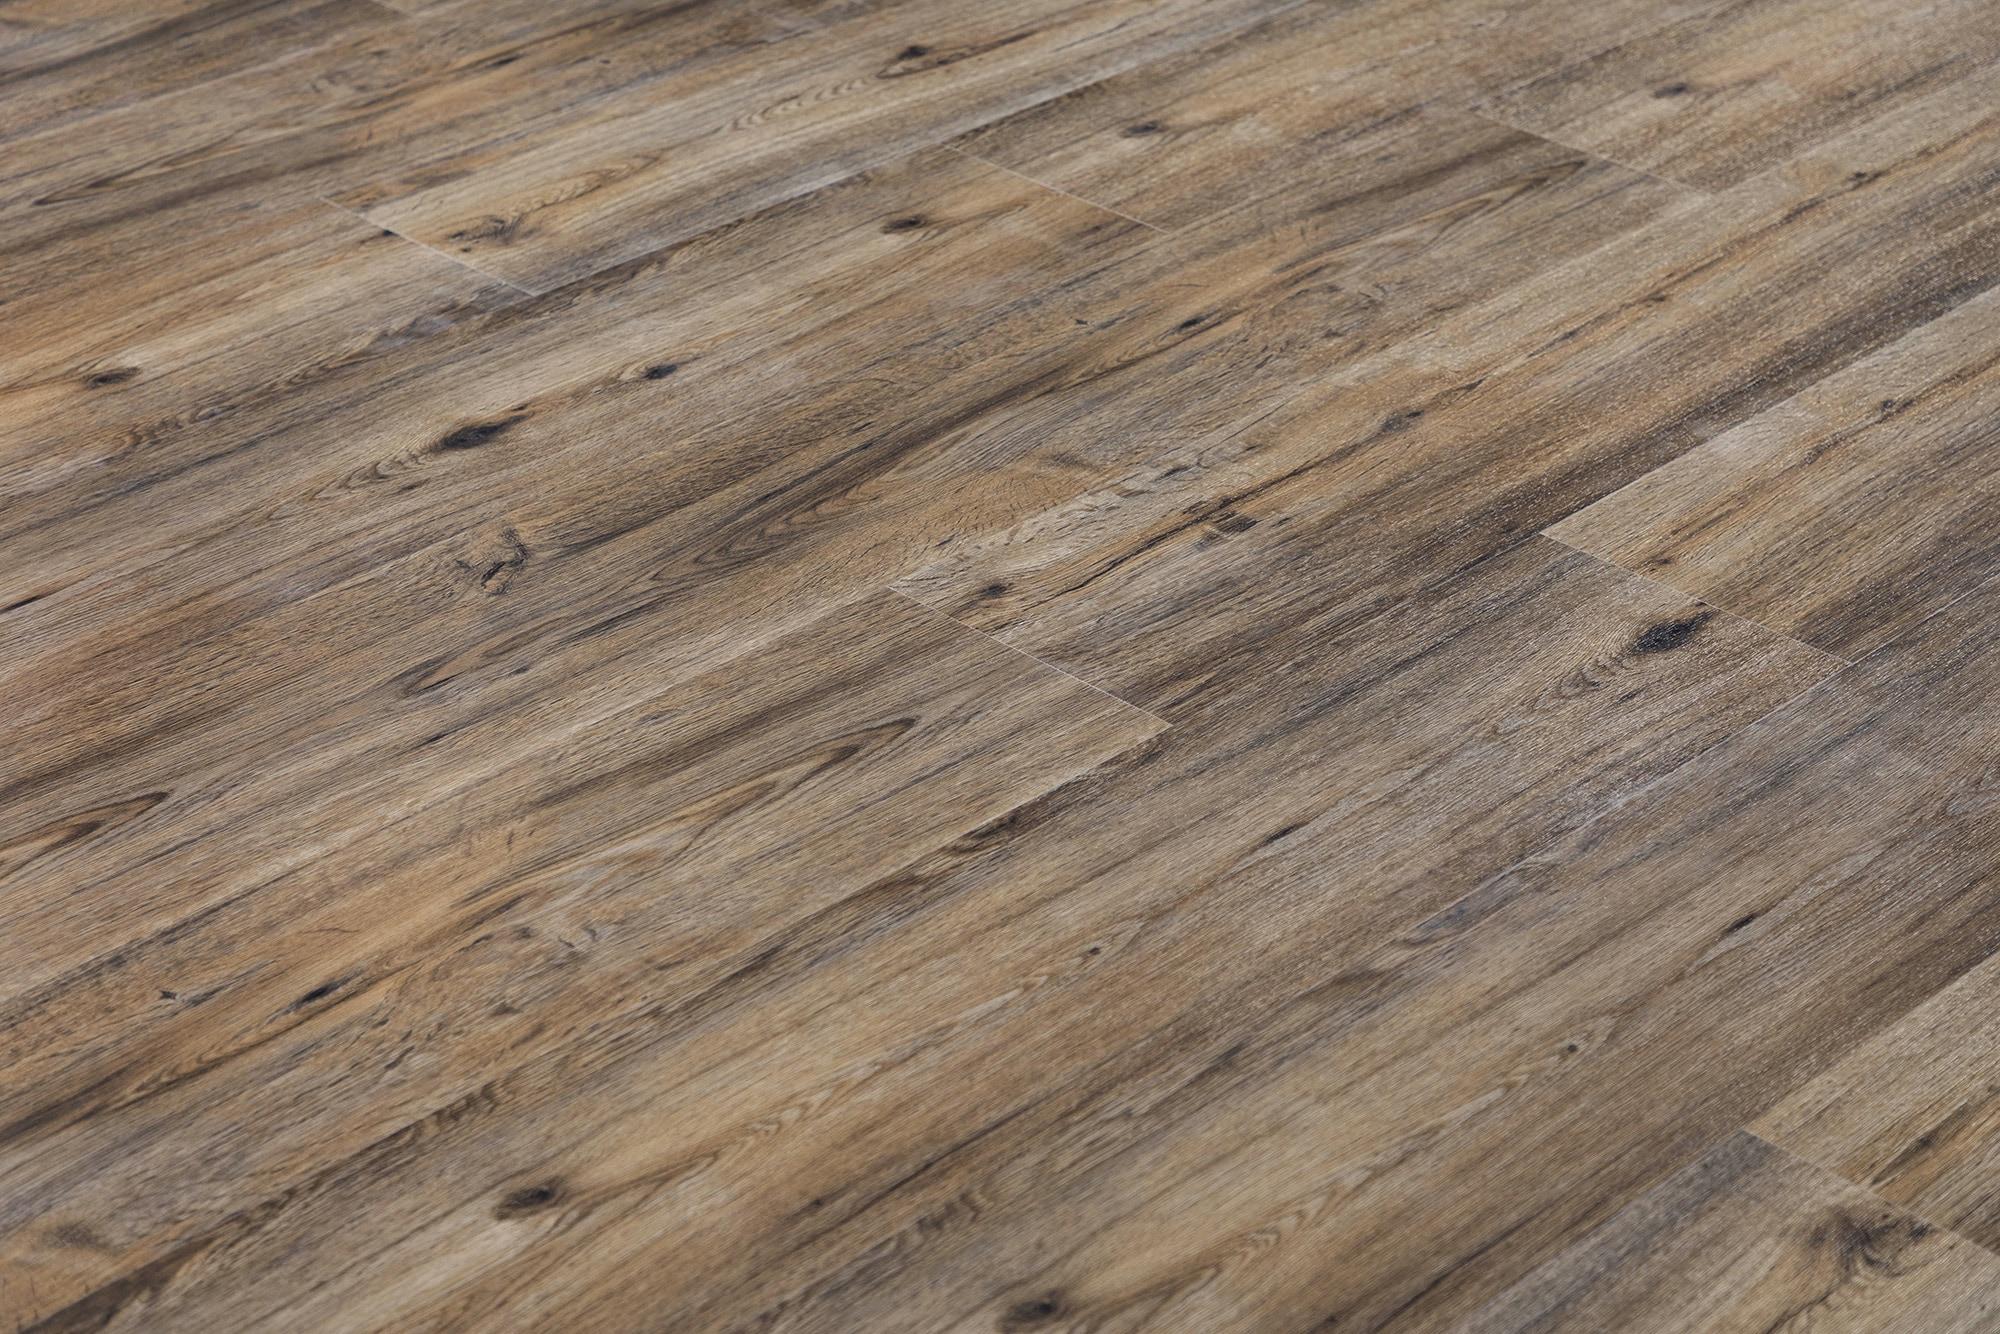 Espresso Texture French Oak / 6.5mm / SPC / Click Lock Vinyl Planks - 6.5mm SPC Click Lock - XL Jumbo Collection 0